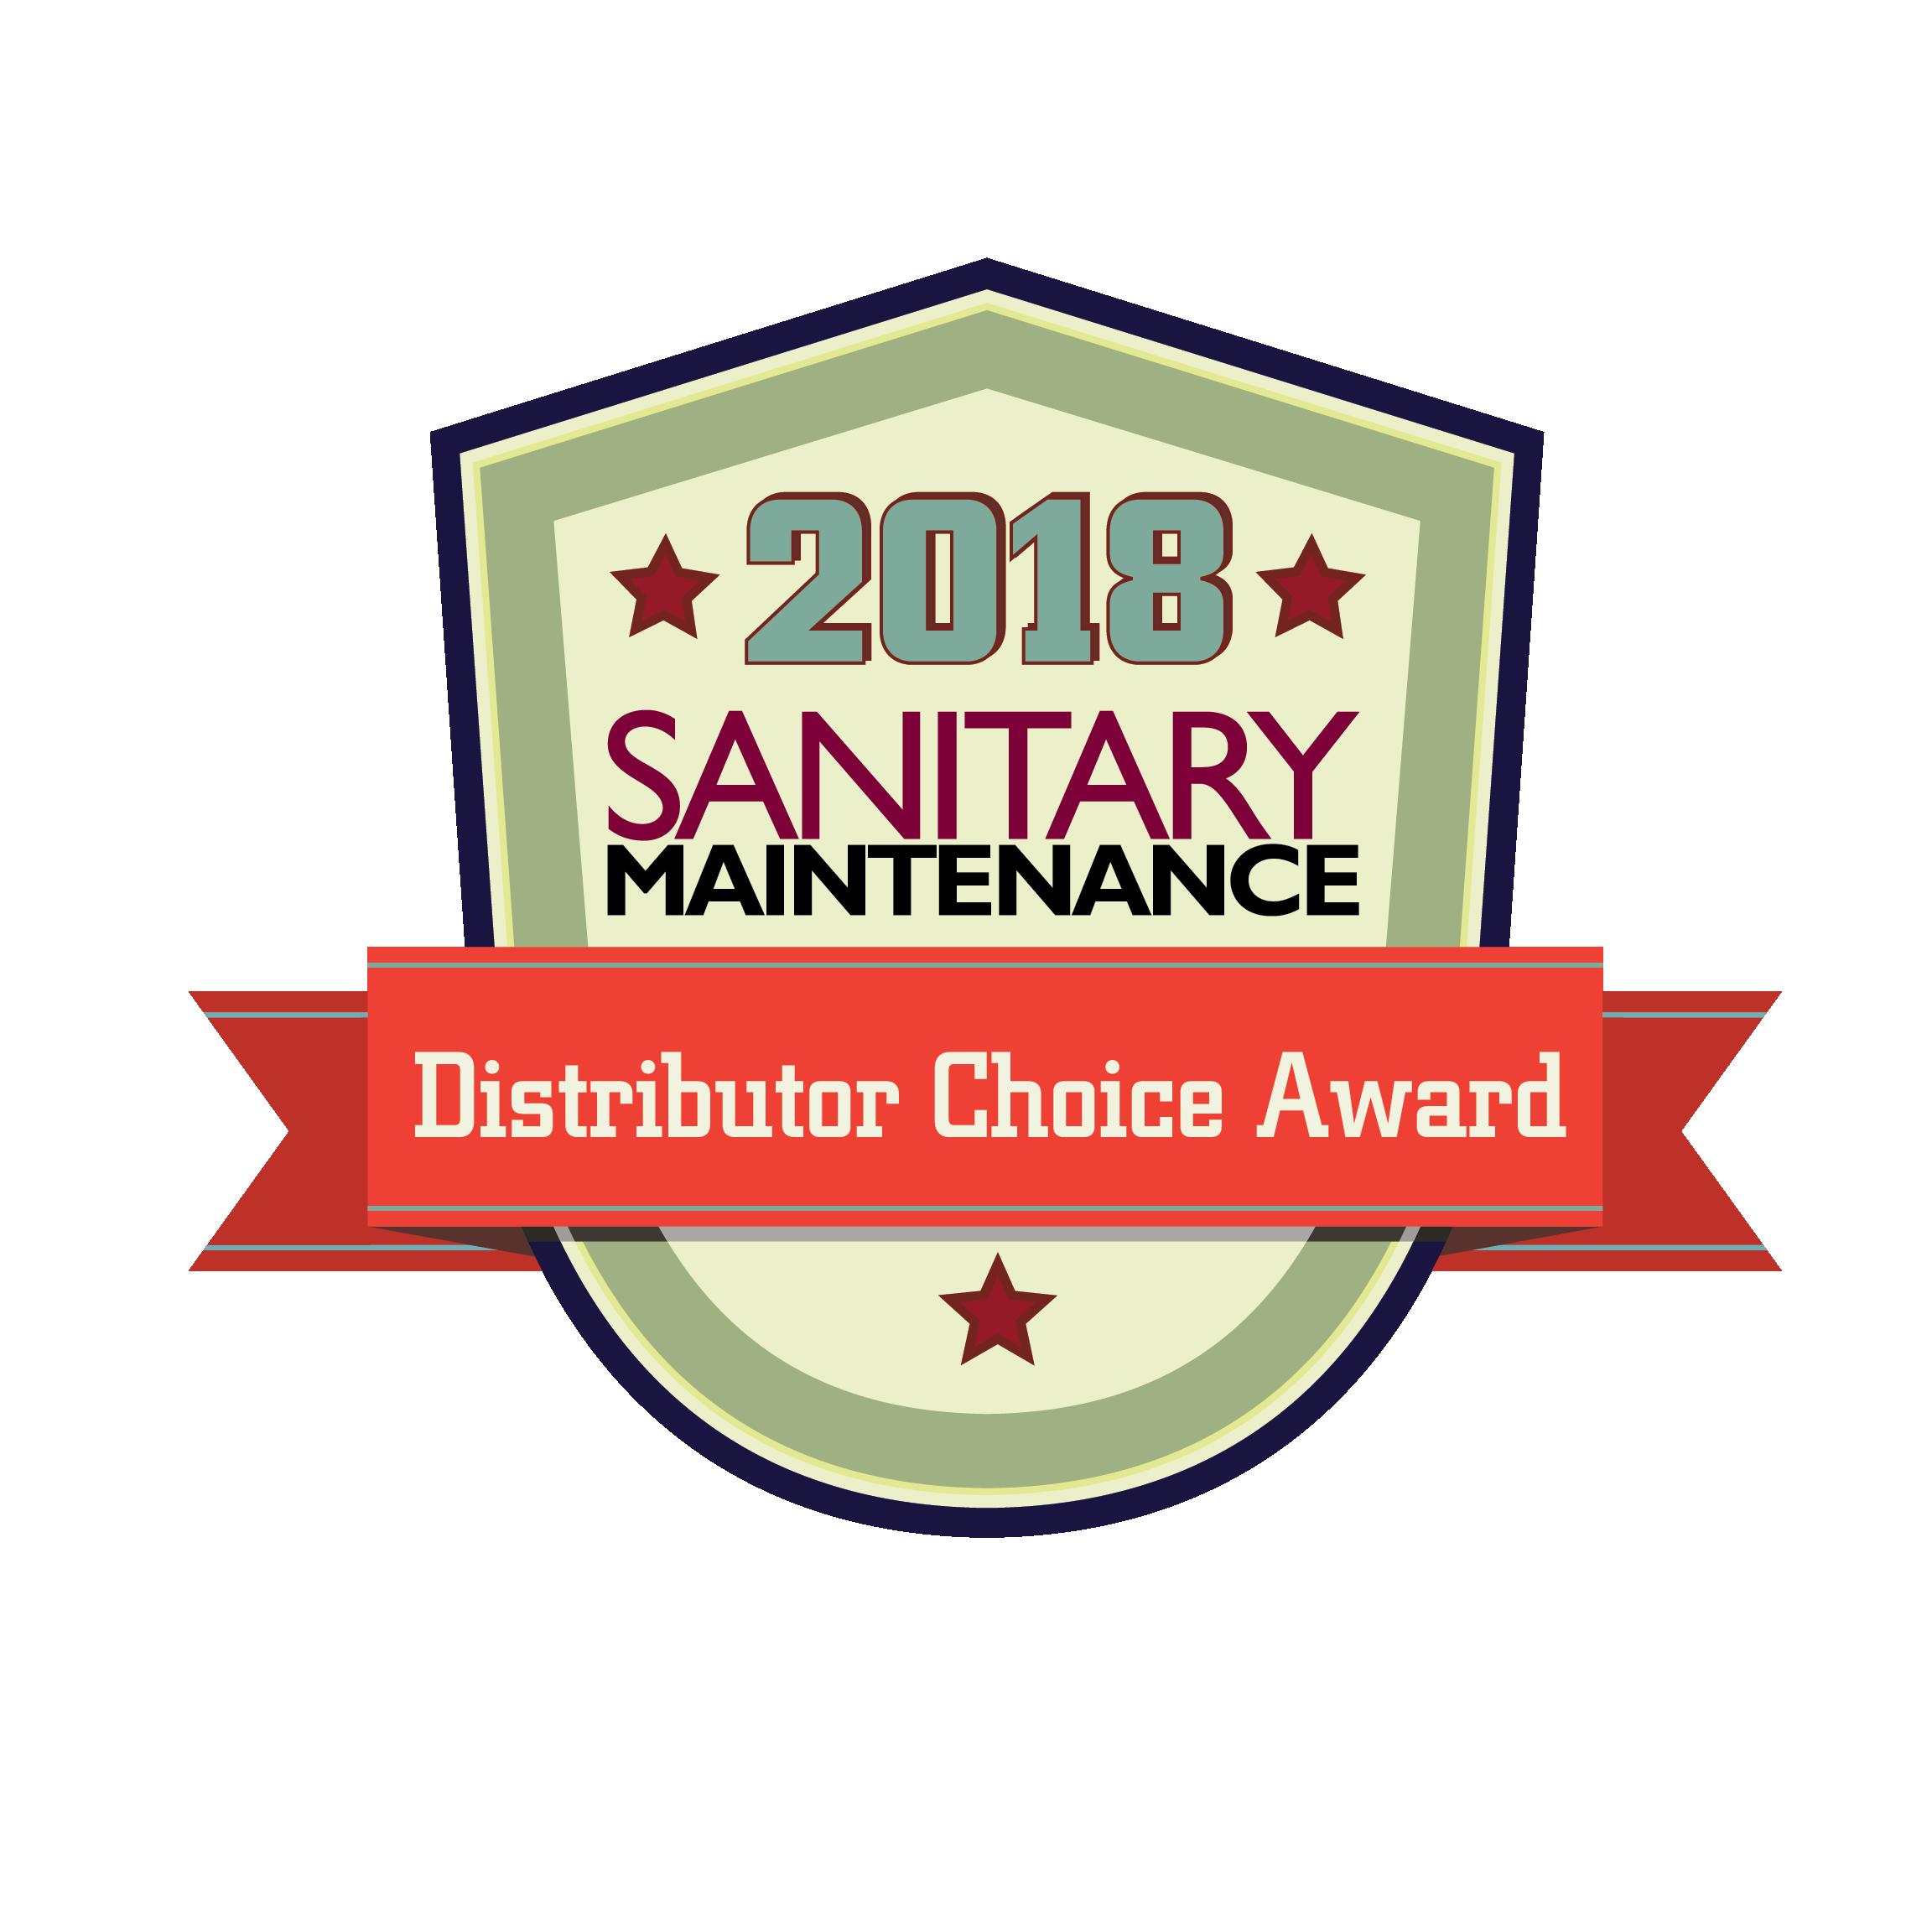 Sanitary Maintenance Distributors Choice Awards